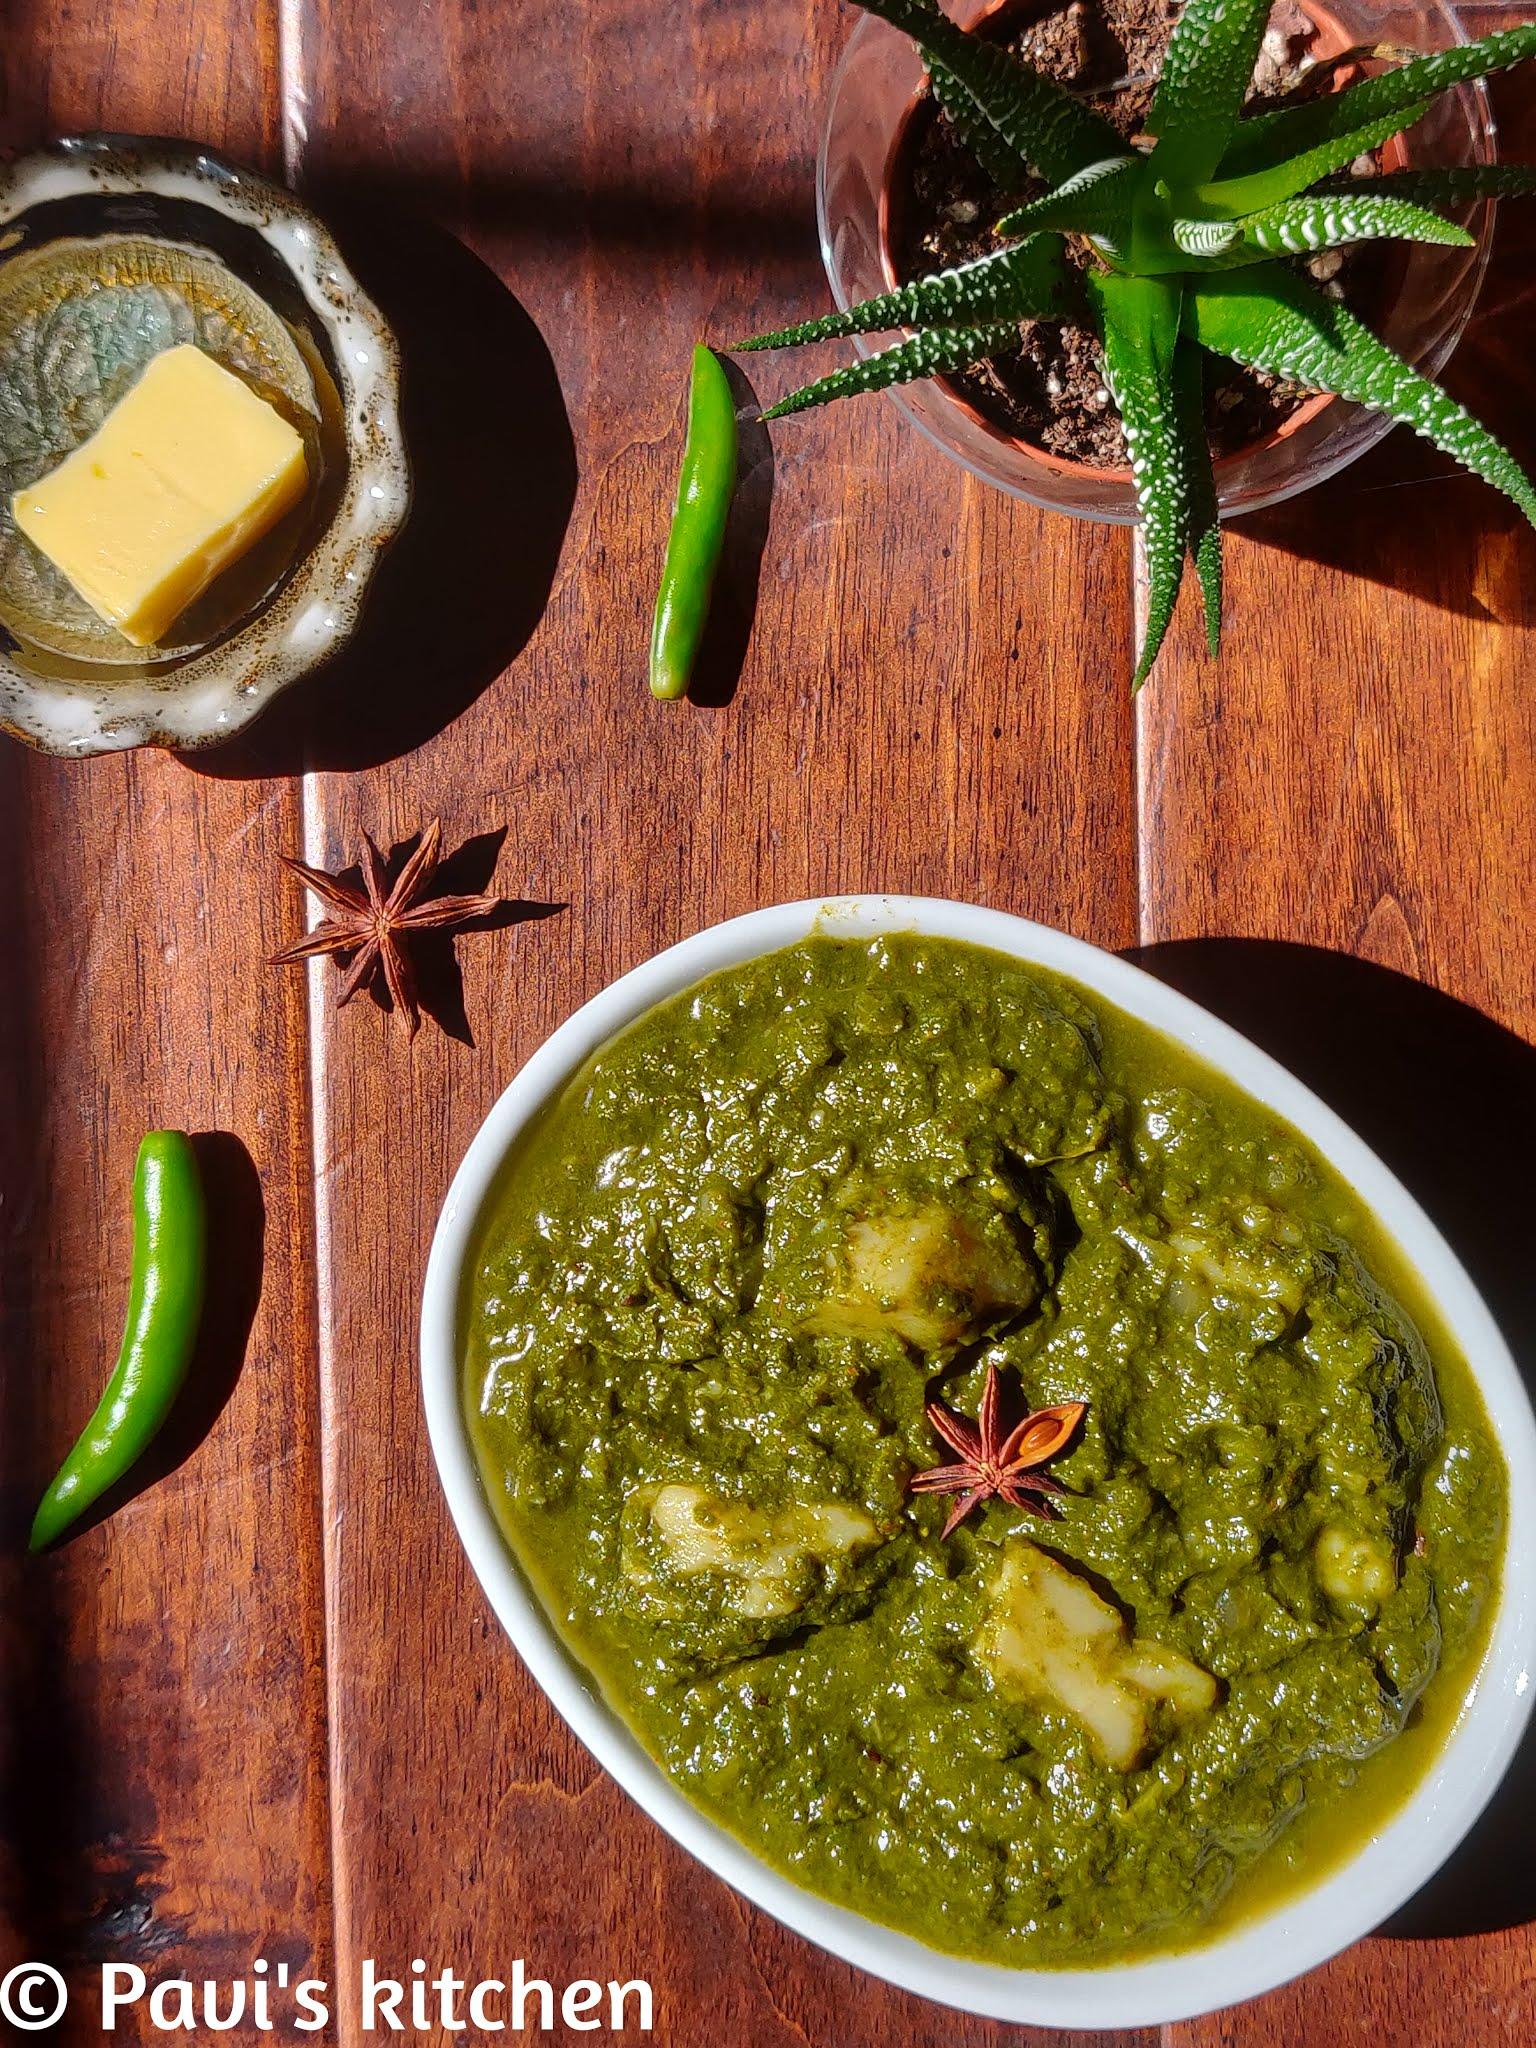 Aloo palak gravy recipe | Punjabi Palak aloo gravy | Spinach potato curry recipe